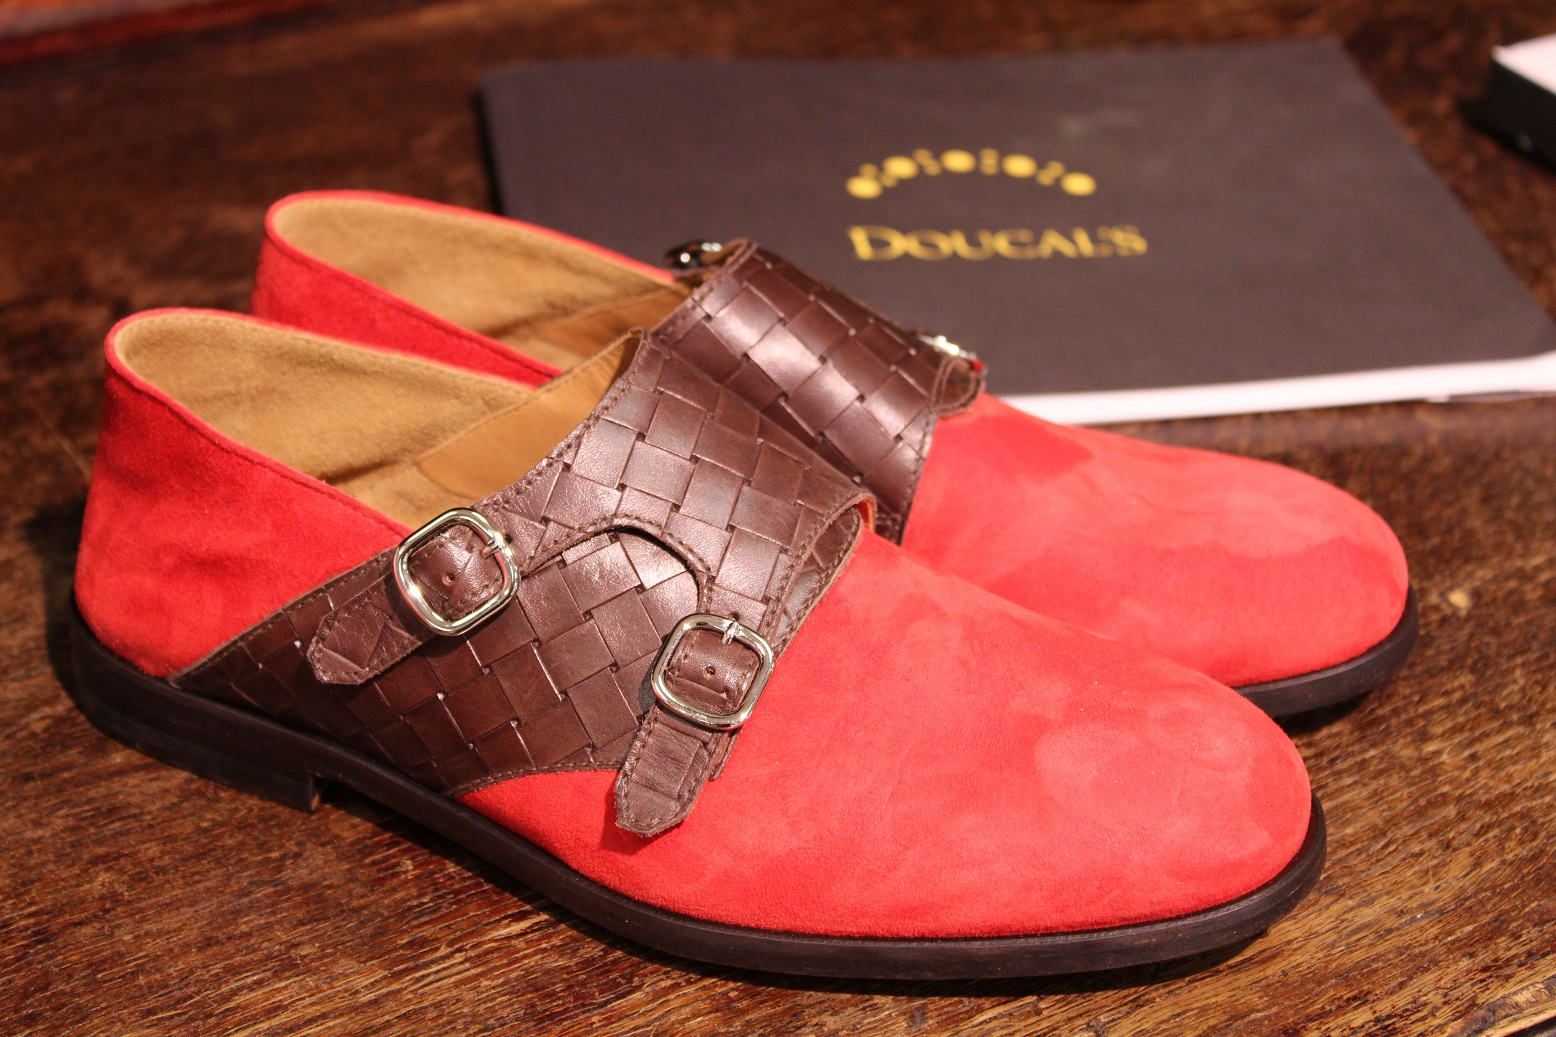 gallery_1_anglijskaja-jelegantnost-i-italjanskij-komfort-jekskljuzivnoj-obuvi-doucals-2